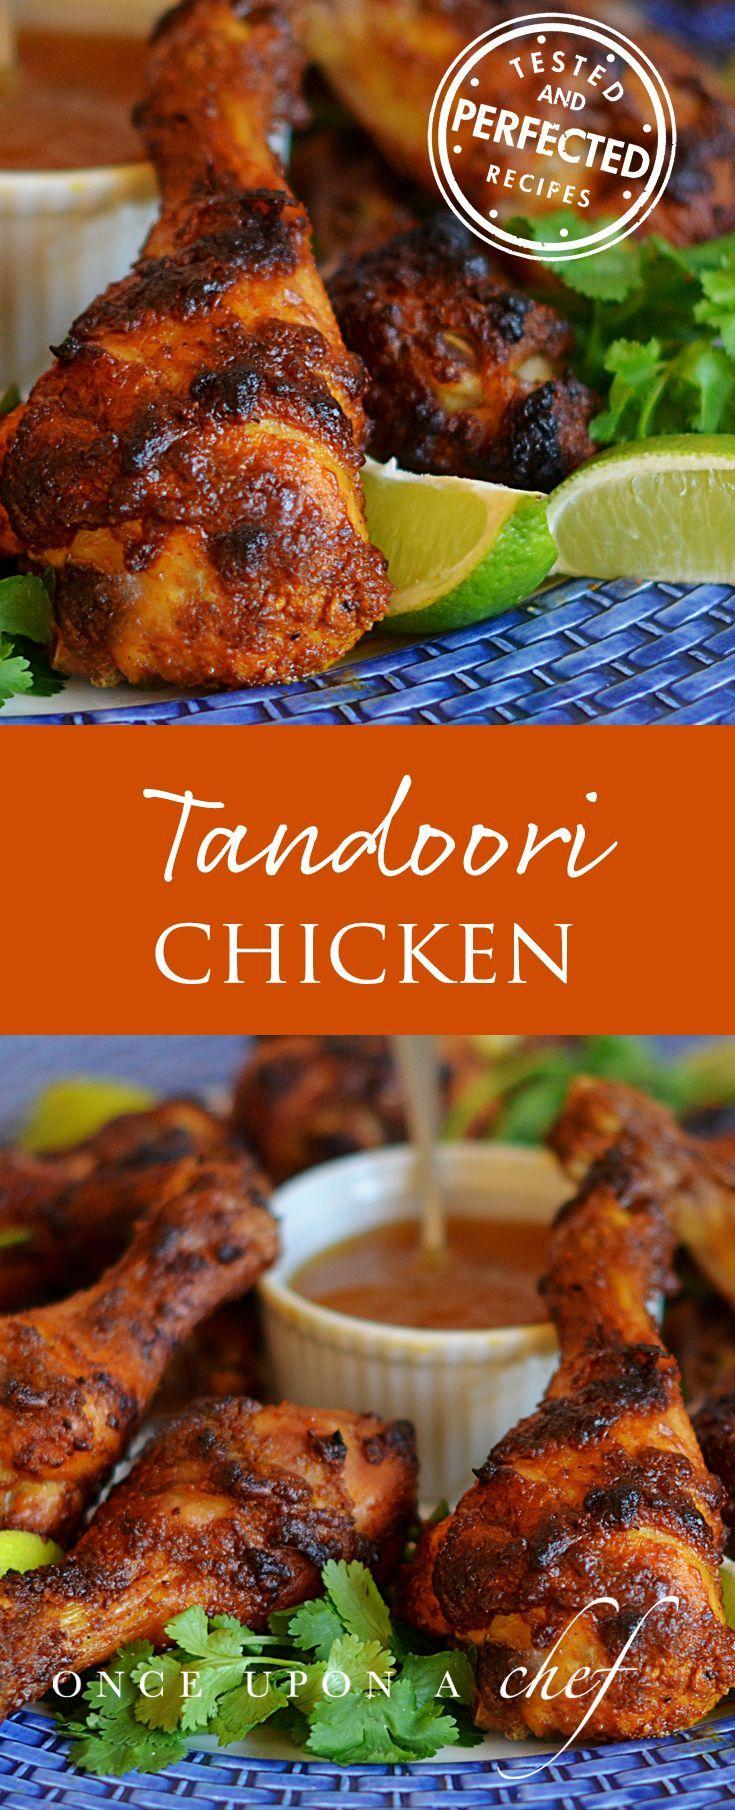 Crispy Tandoori Chicken Drumsticks with Mango Chutney -- add rice as a side